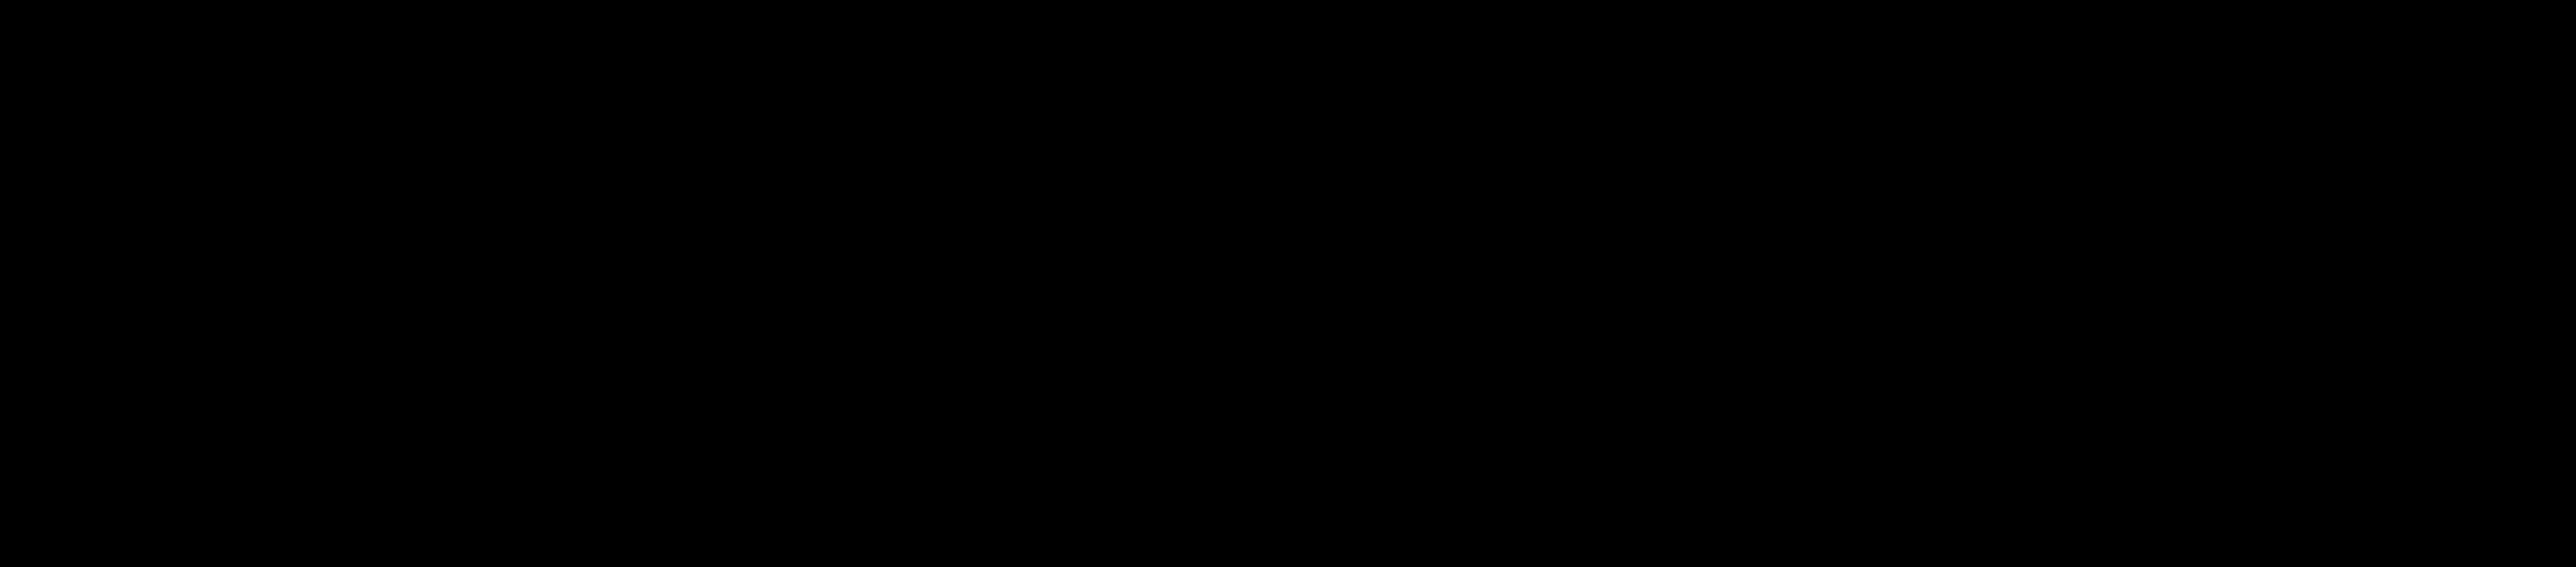 HORIZON CONSOLES SECONDARY BLACK PART OF SBFI GROUP